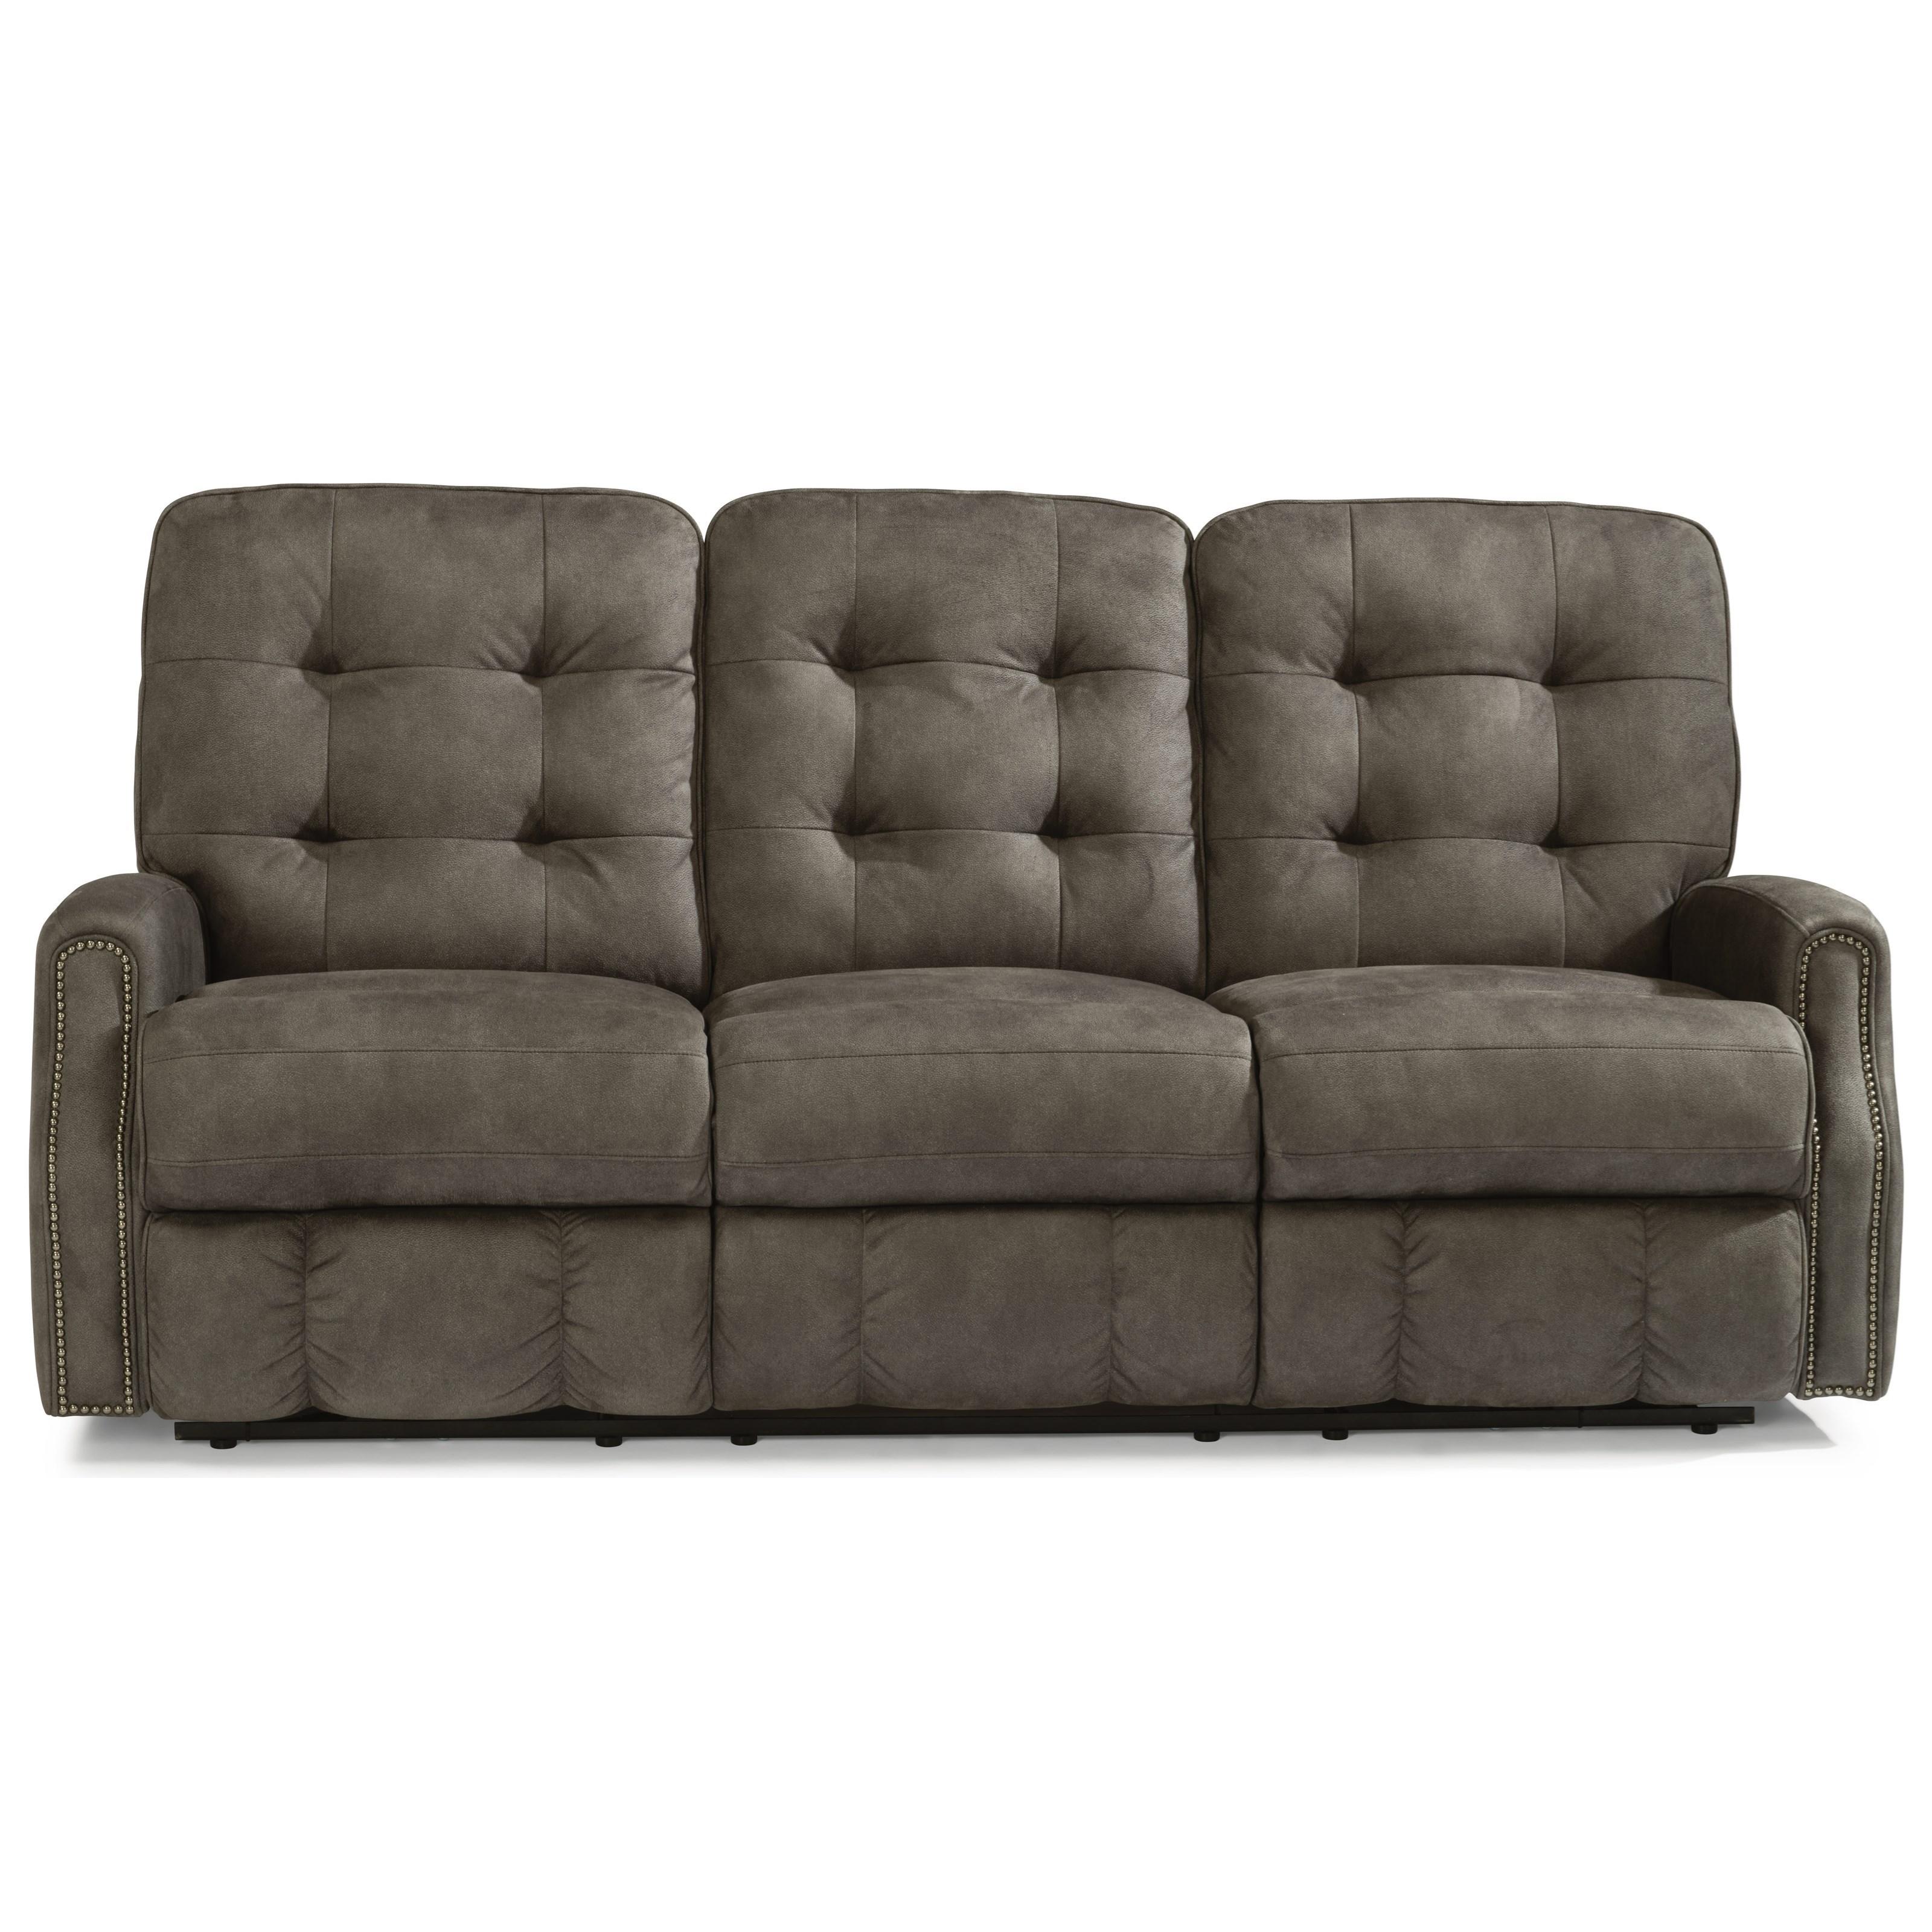 Devon Power Reclining Sofa with Power Headrests by Flexsteel at Mueller Furniture